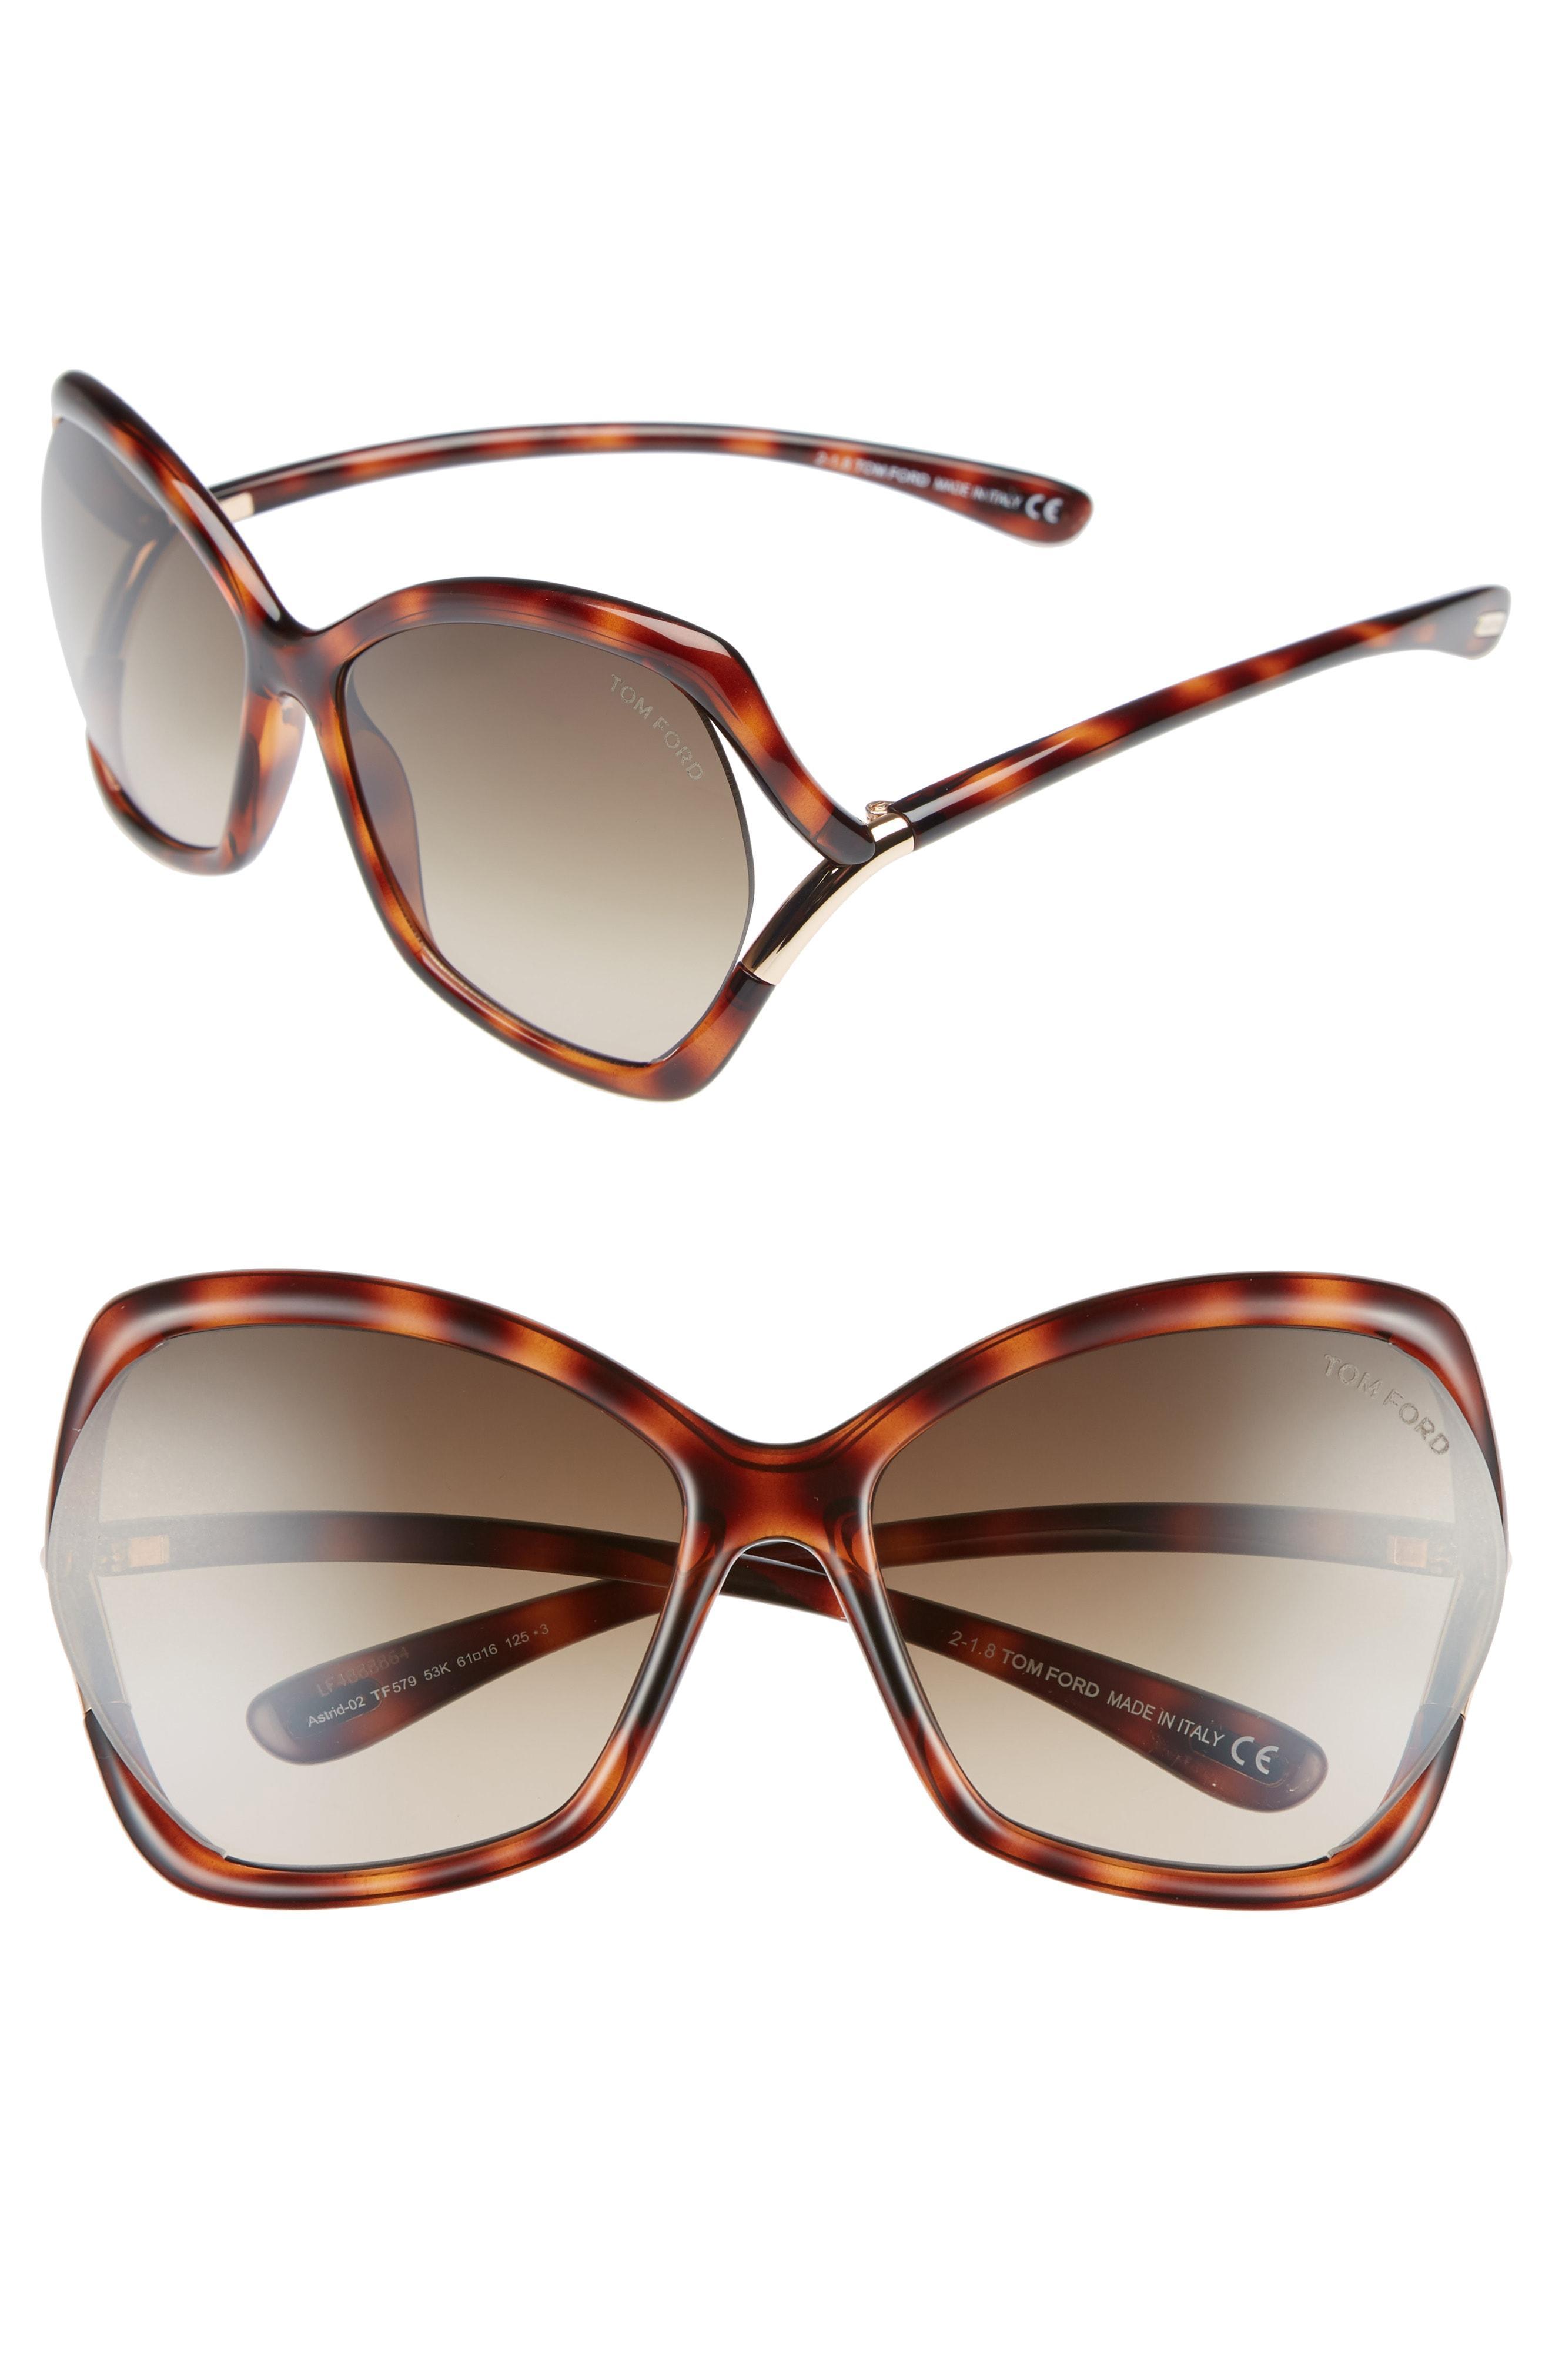 4efd90fae66e Tom Ford - Multicolor Astrid 61mm Geometric Sunglasses - Havana  Rose Gold   Roviex -. View fullscreen